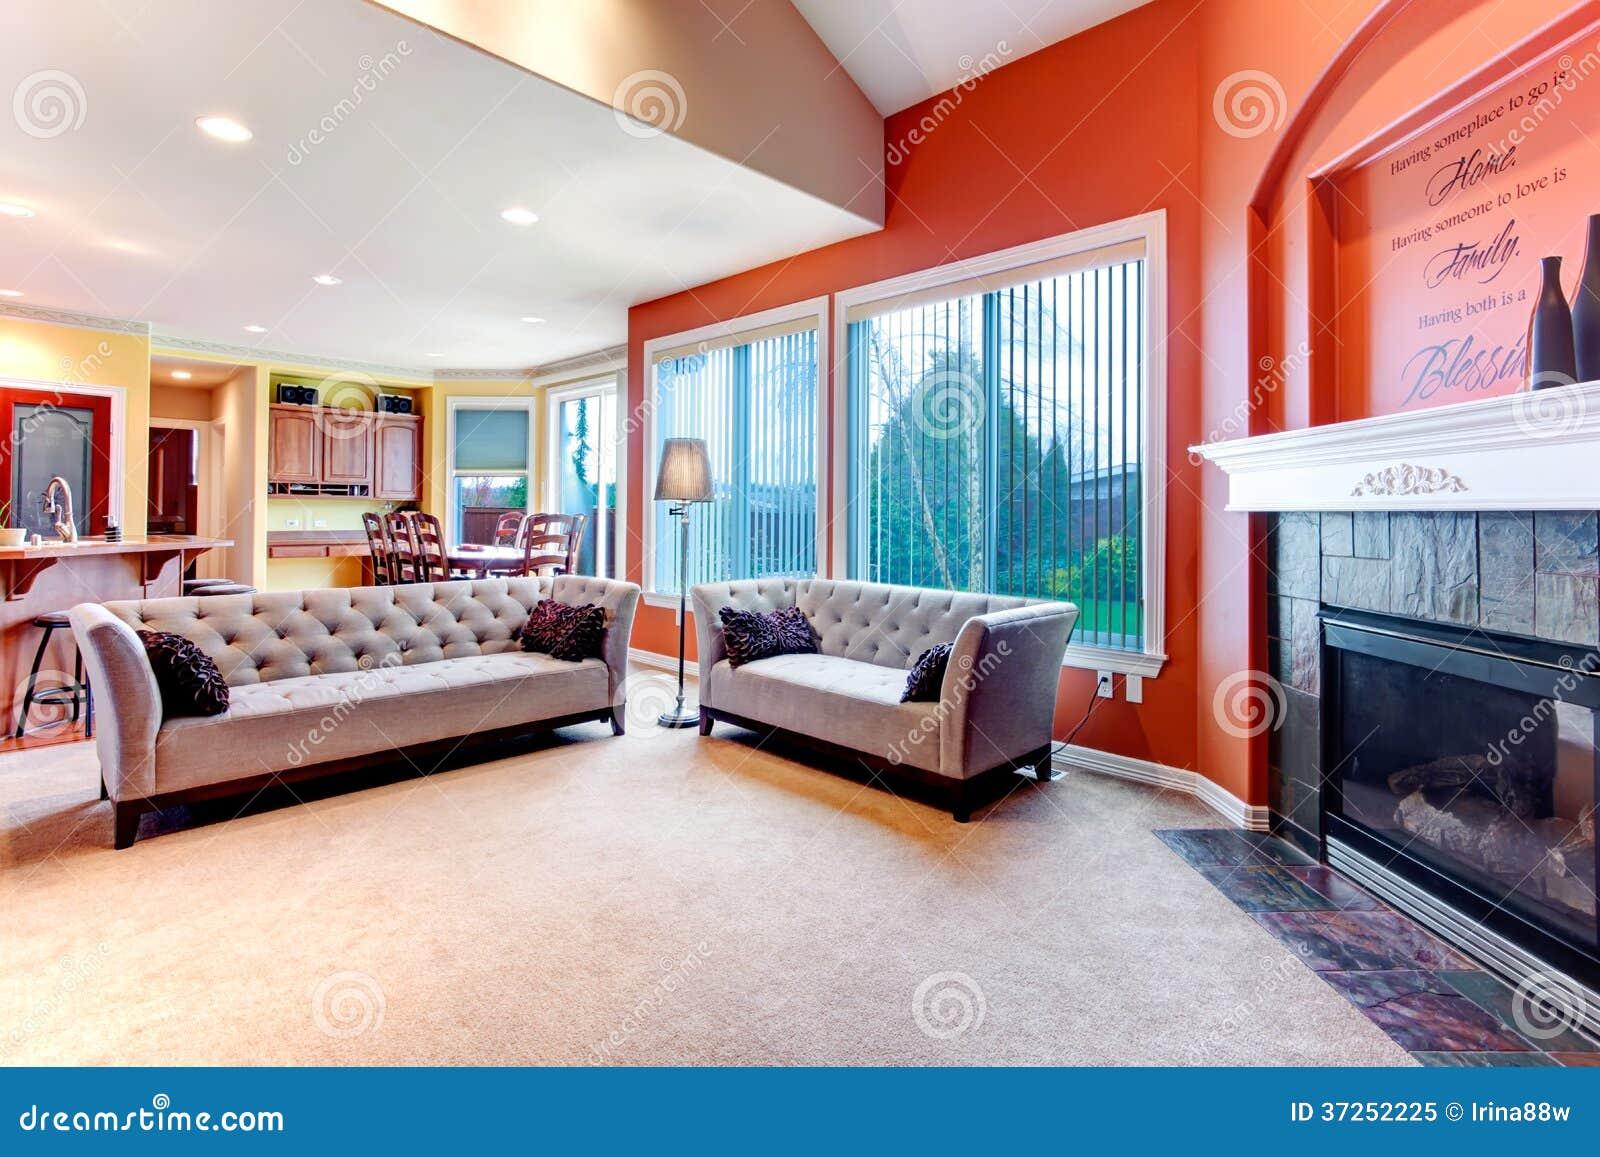 bright orange color scheme for living room royalty free